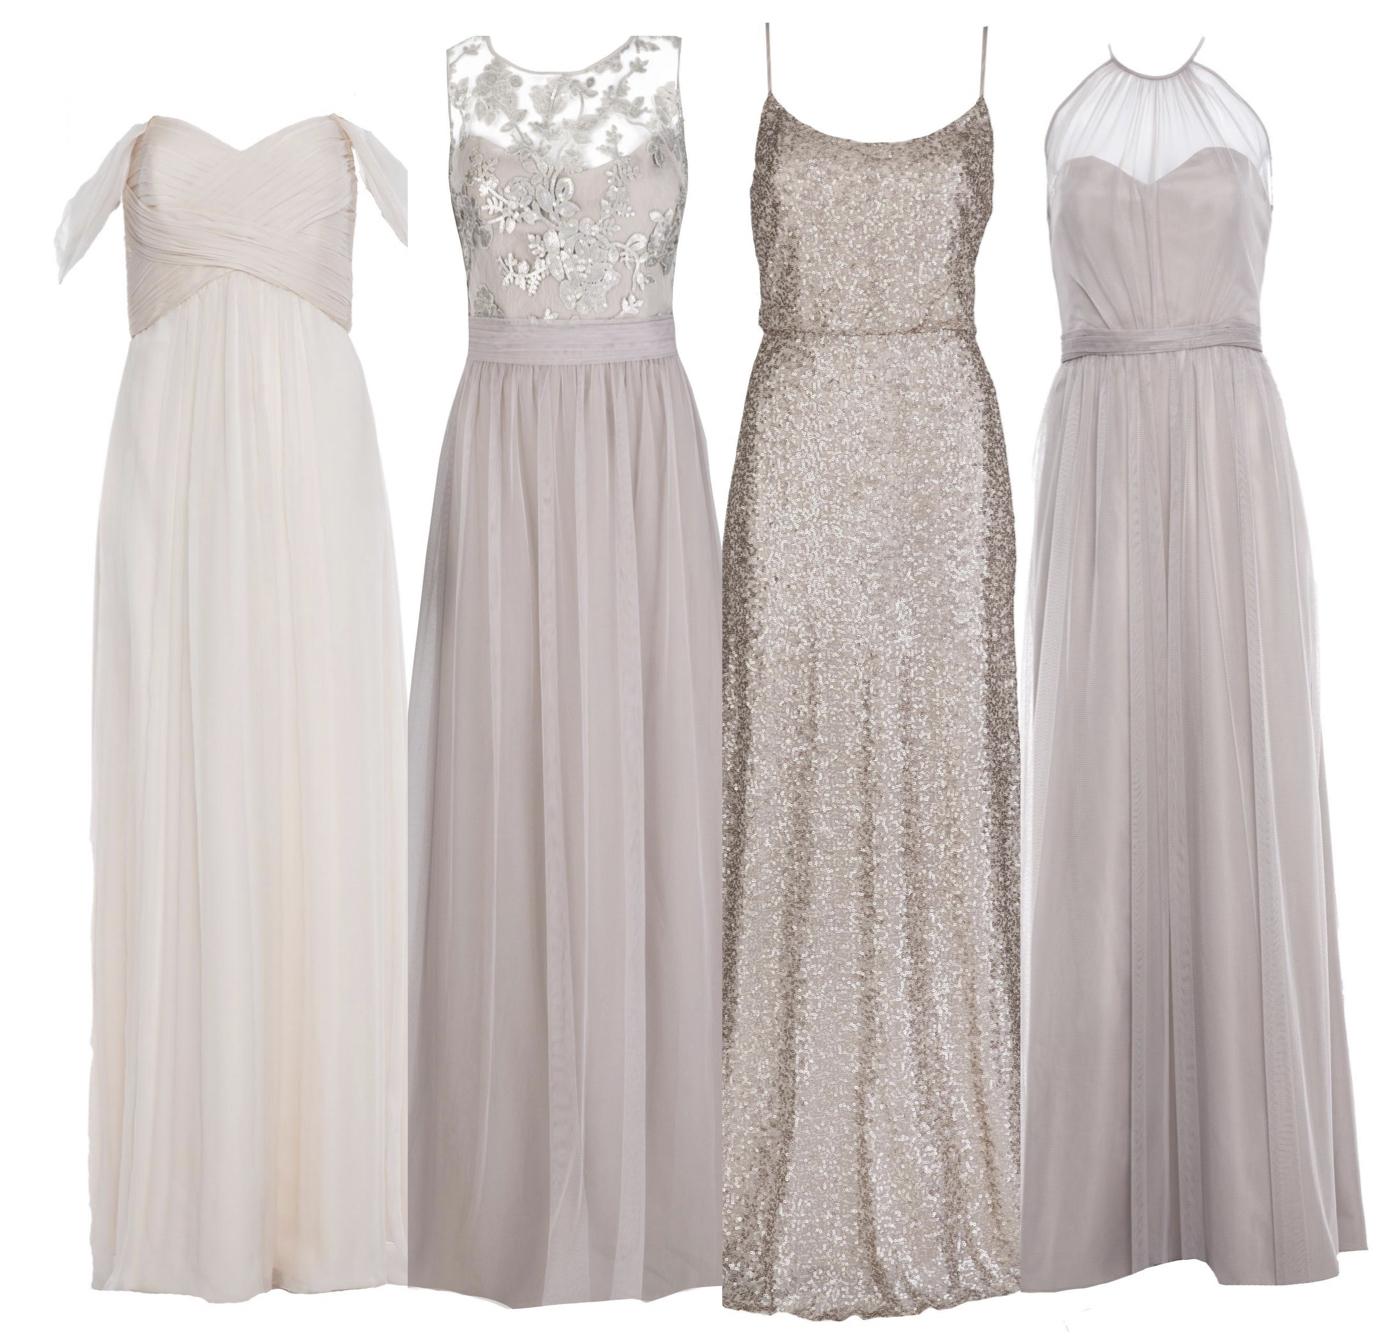 Similar tones, different fabrics - Amsale from $380